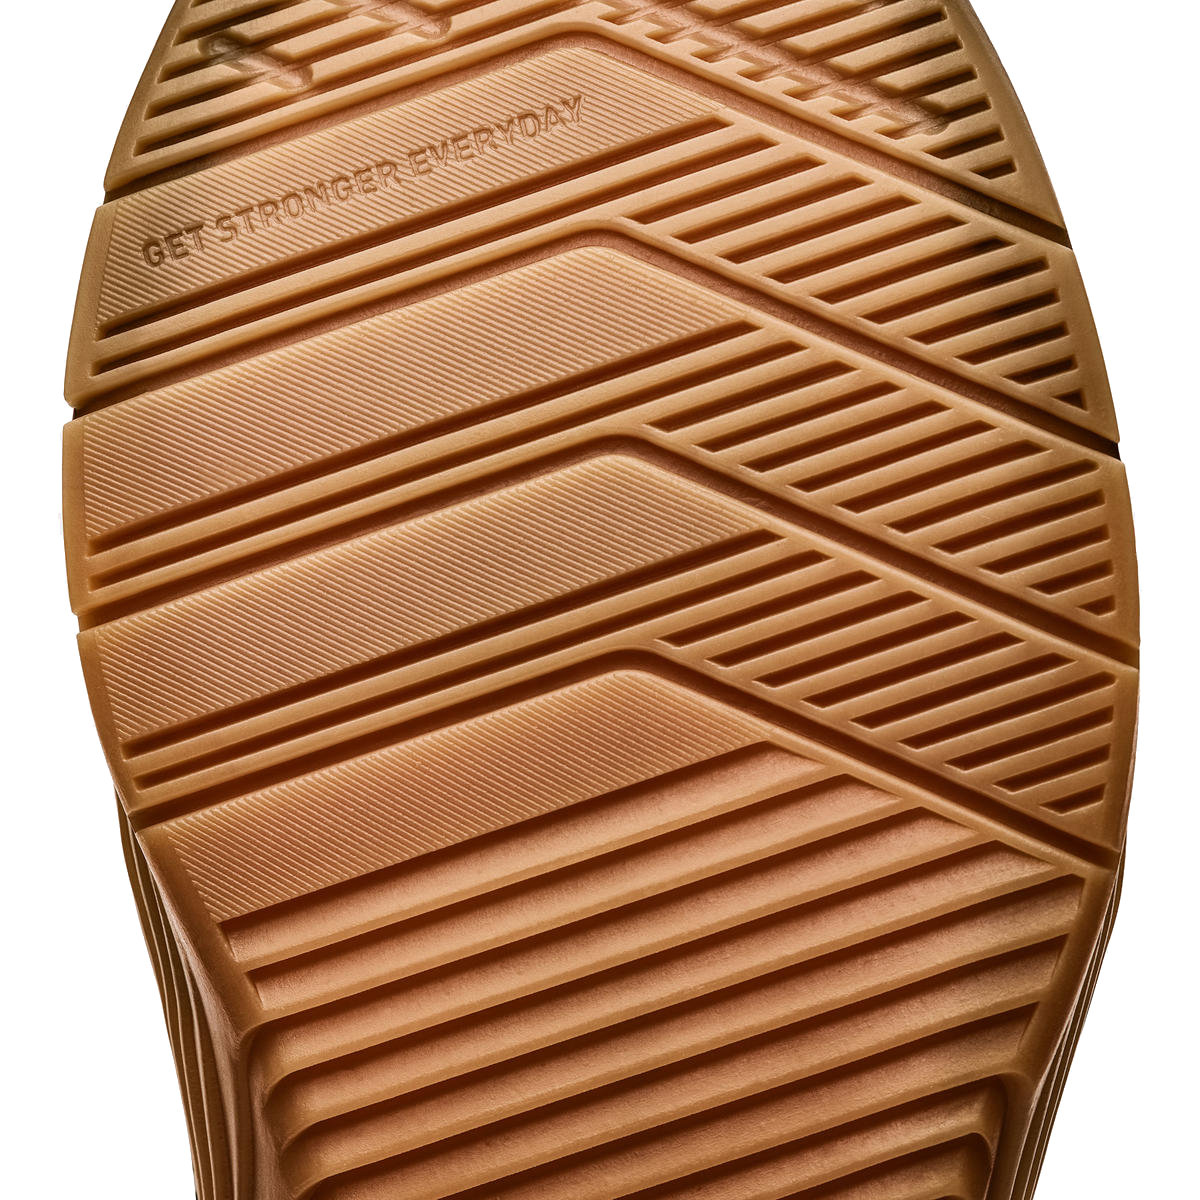 Men's Nike Metcon 6 Training Shoes - Color: Valerian Blue - Size: 3.5 - Width: Regular, Valerian Blue, large, image 6